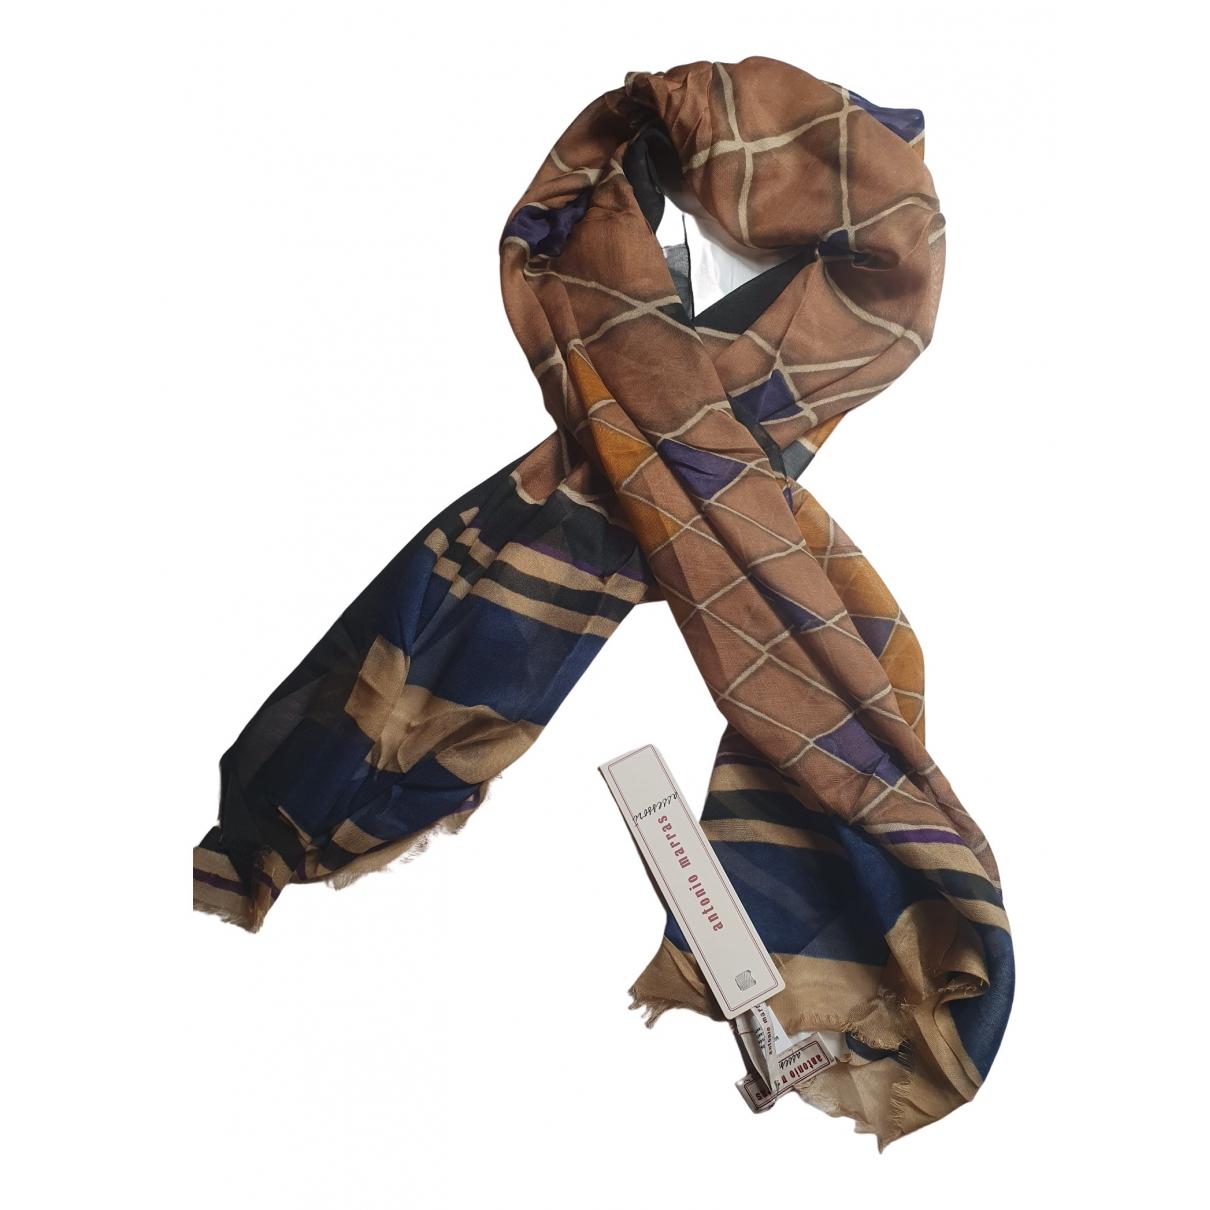 Antonio Marras N Multicolour Cashmere scarf for Women N